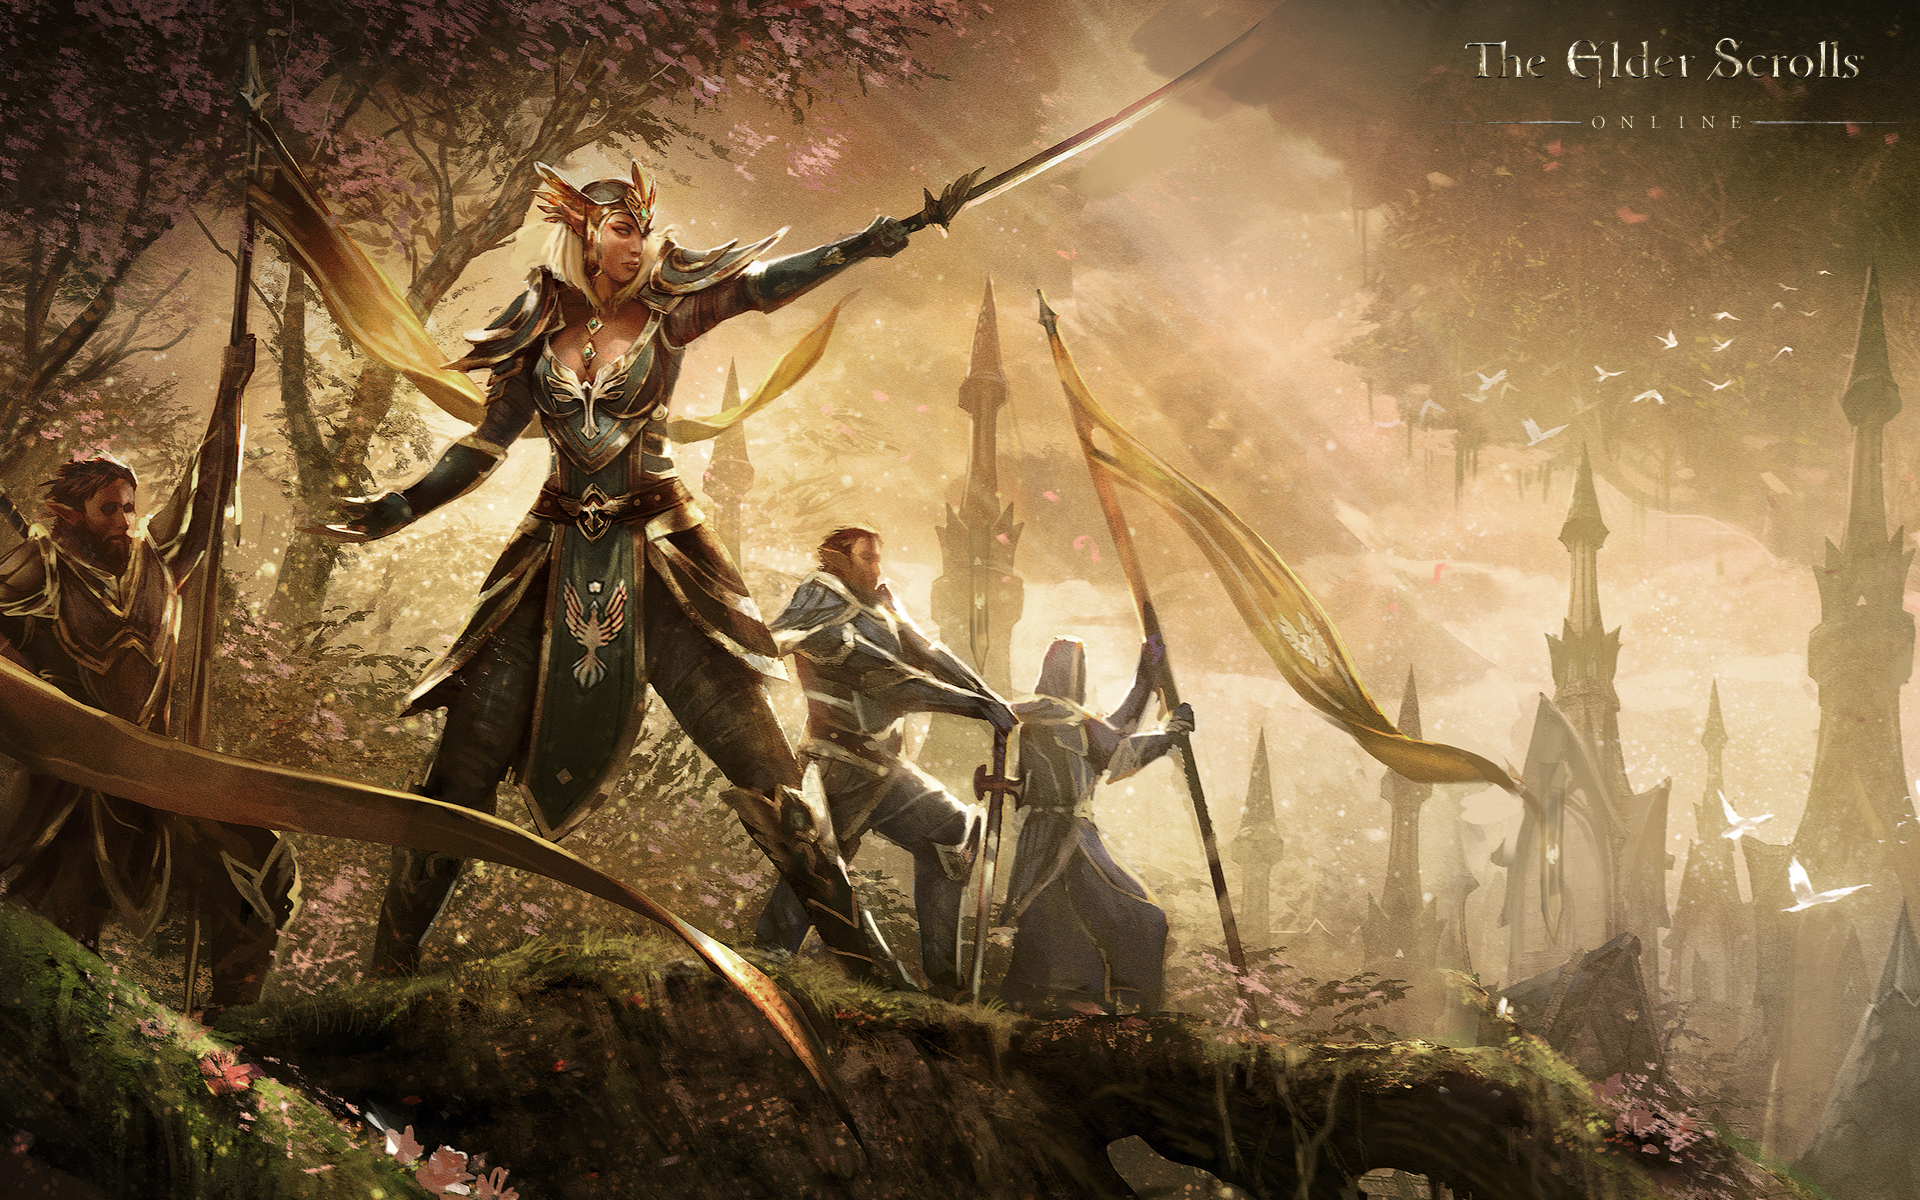 the-elder-scrolls-online-28082013